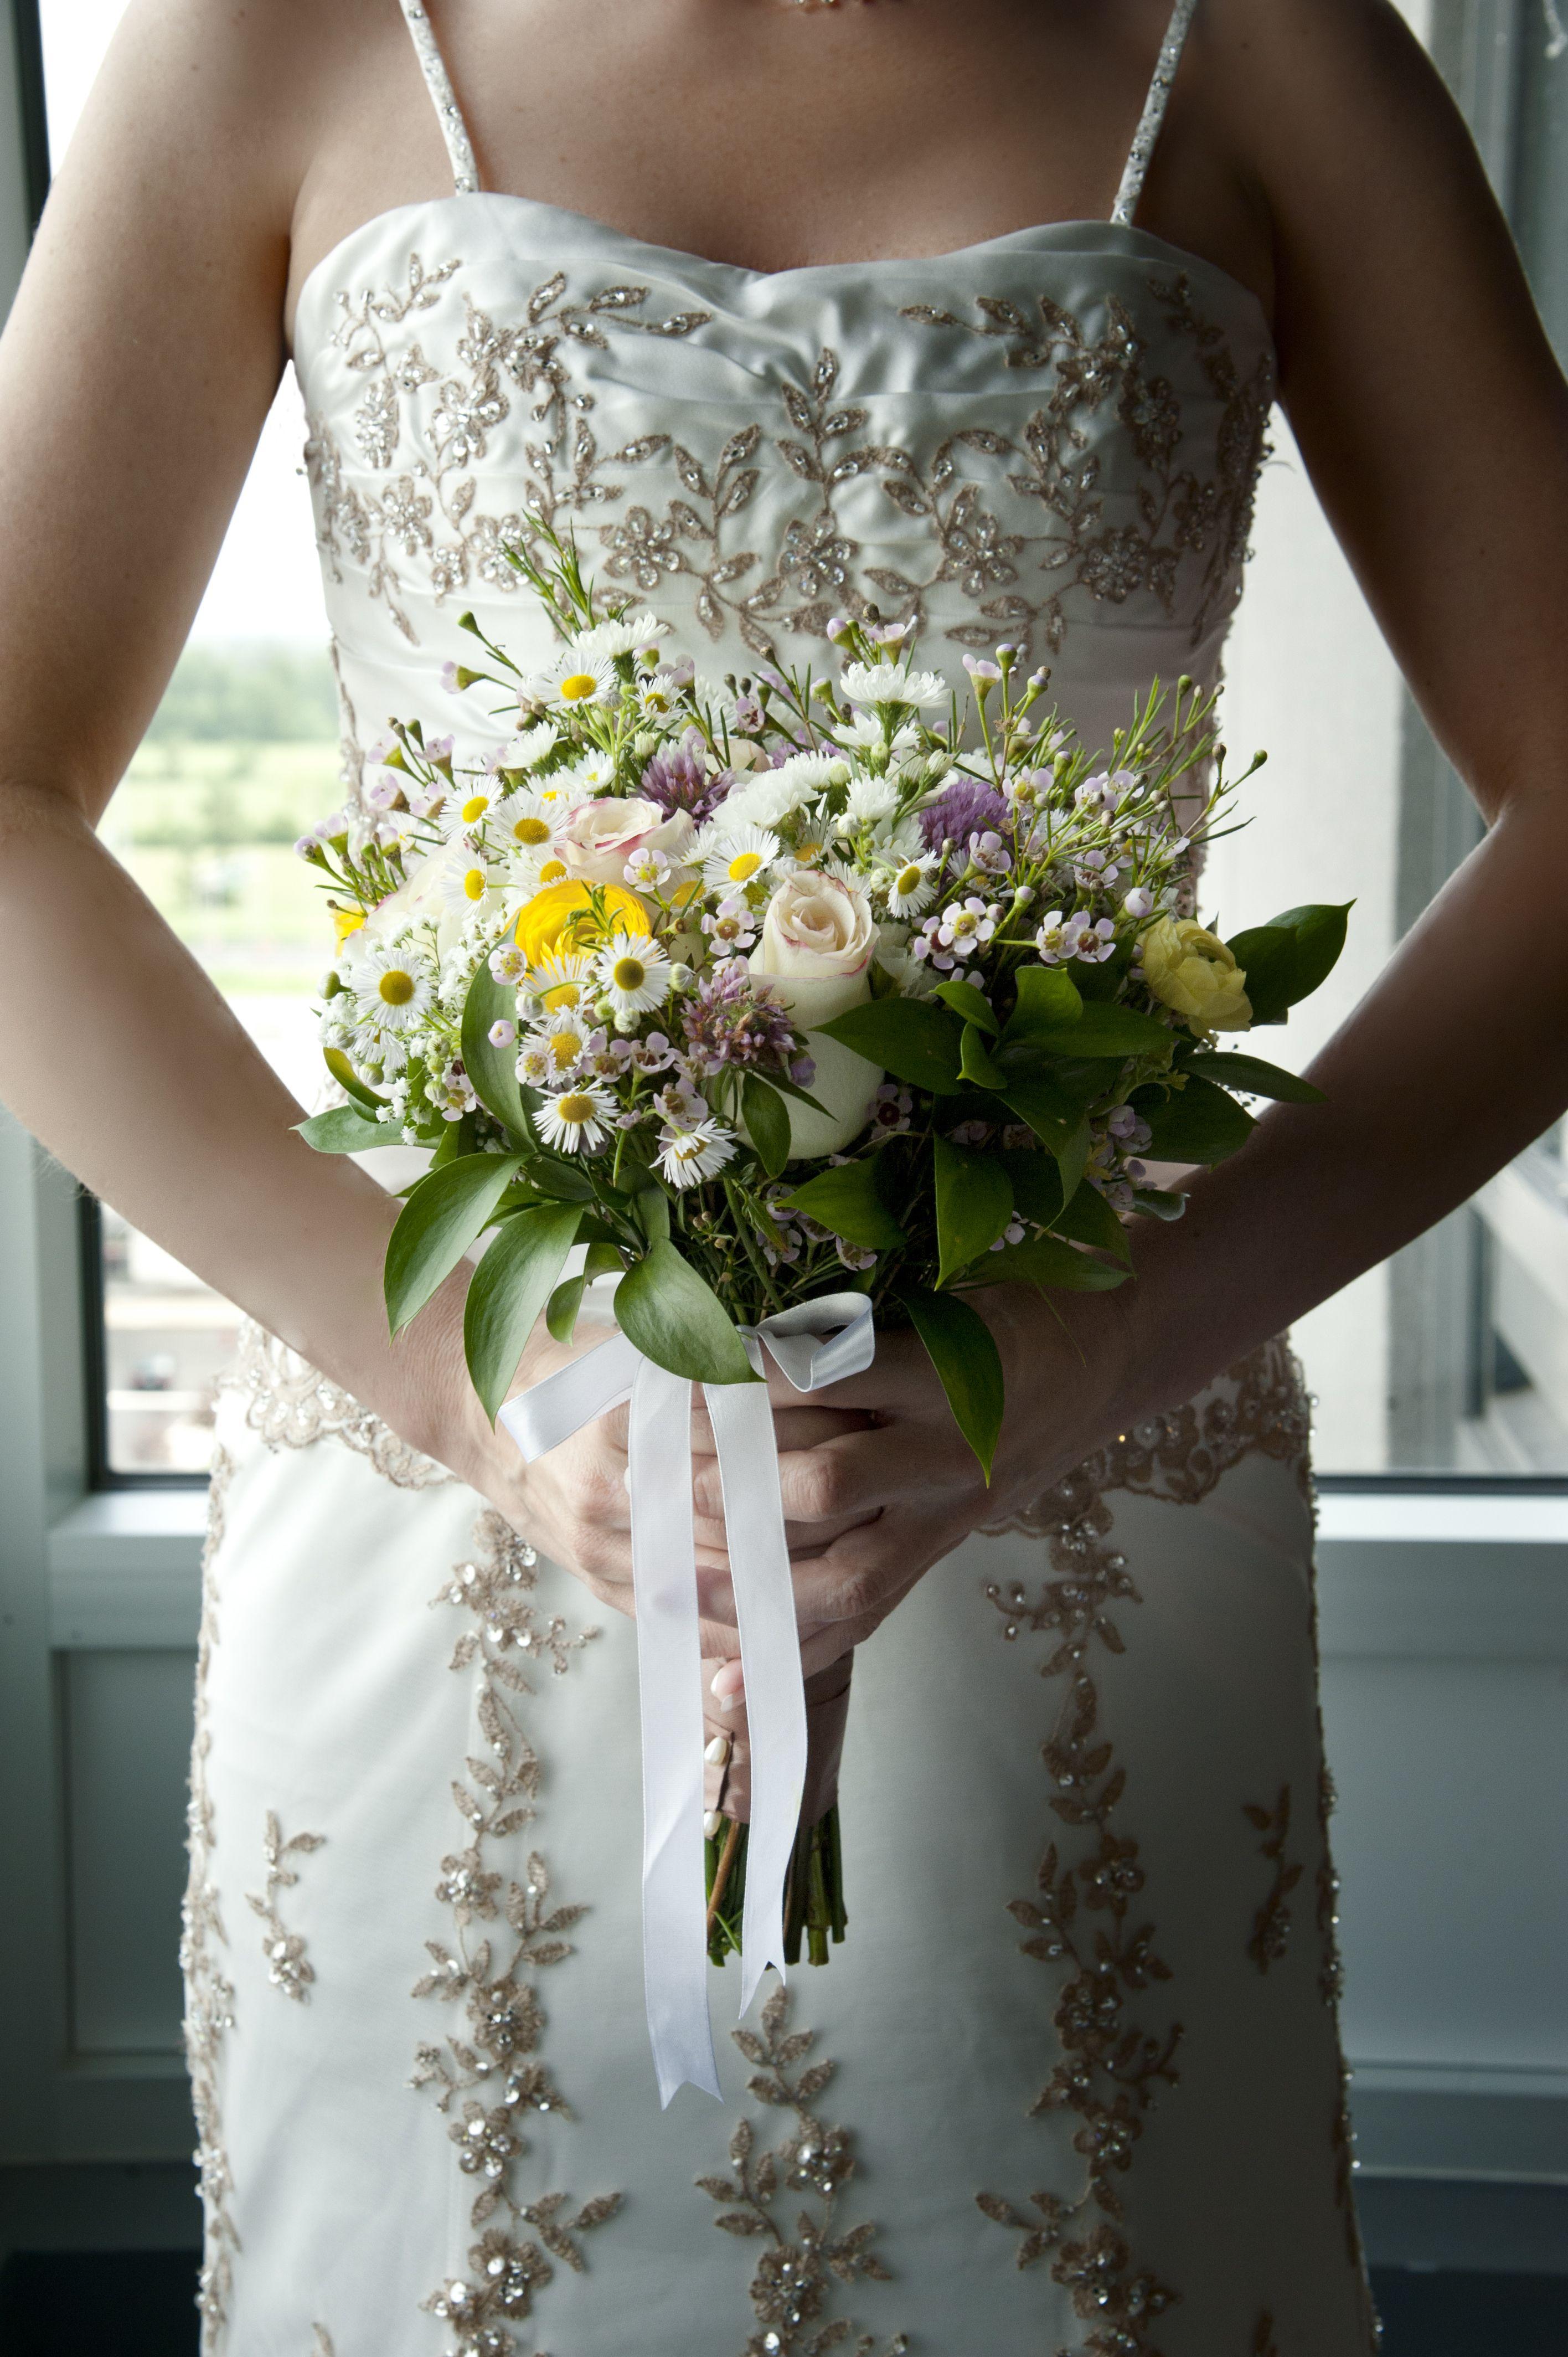 Bridal bouquet roses ranunculus aster wax flower etc